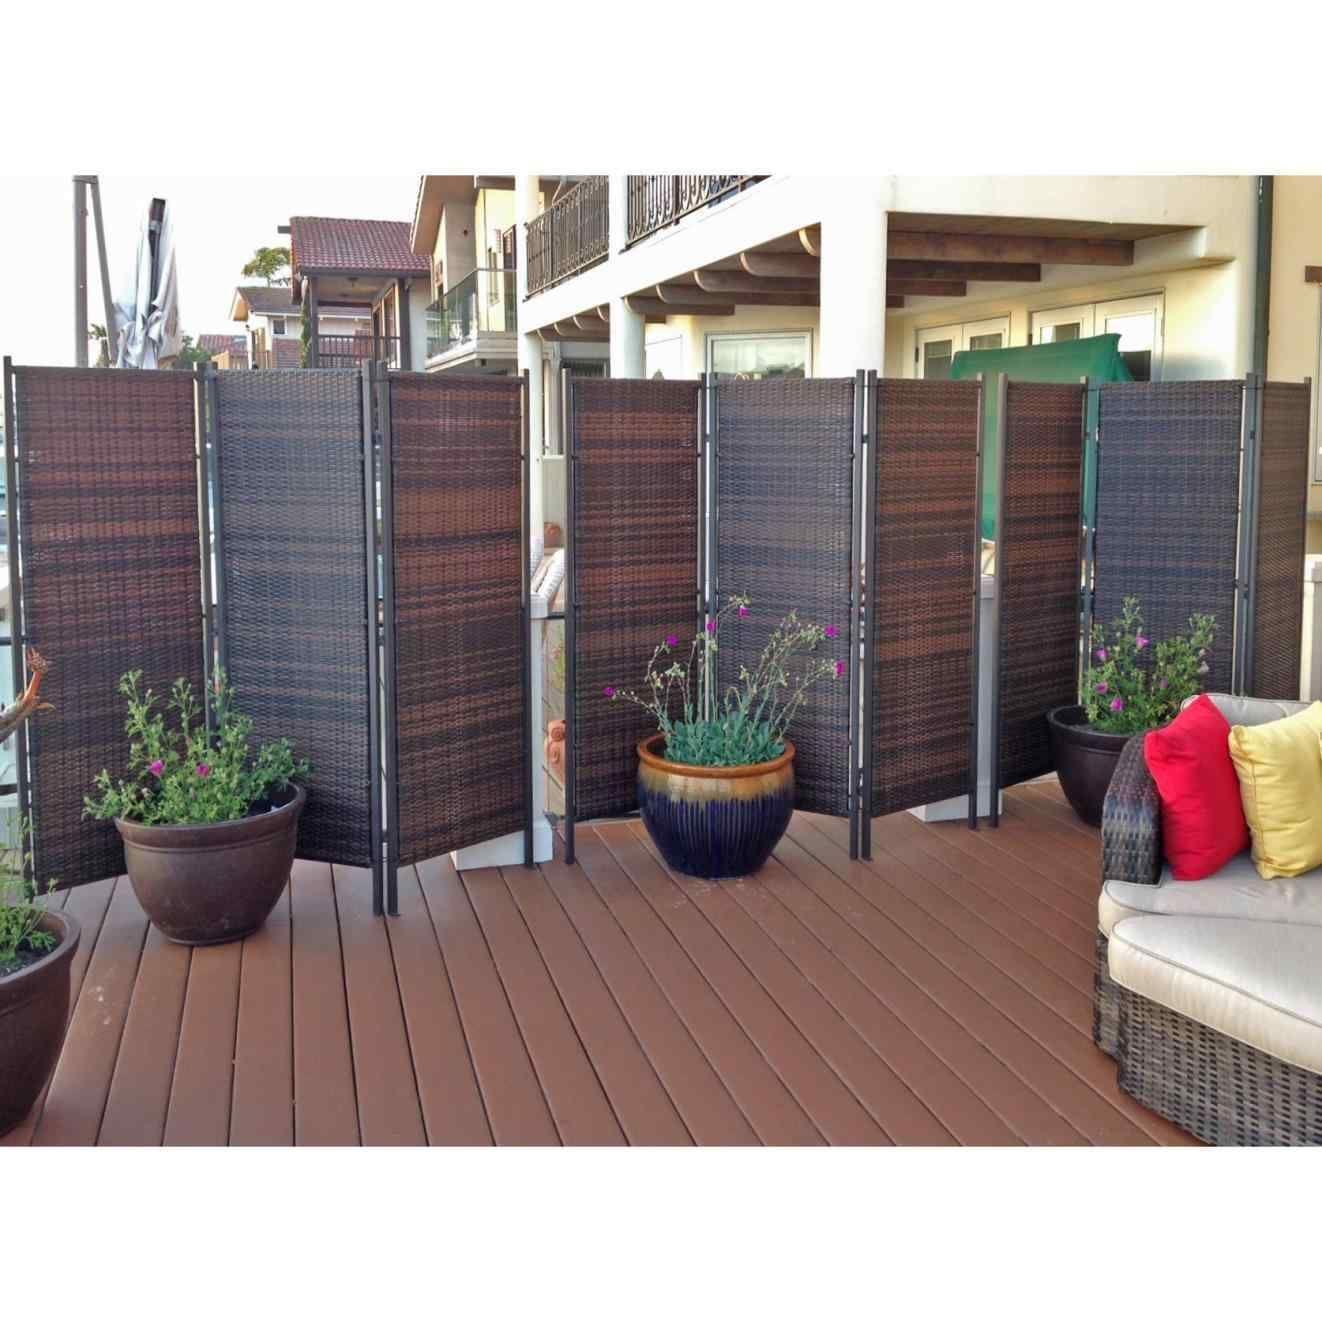 15 Incredible Outdoor Privacy Screens Design Ideas For Decks